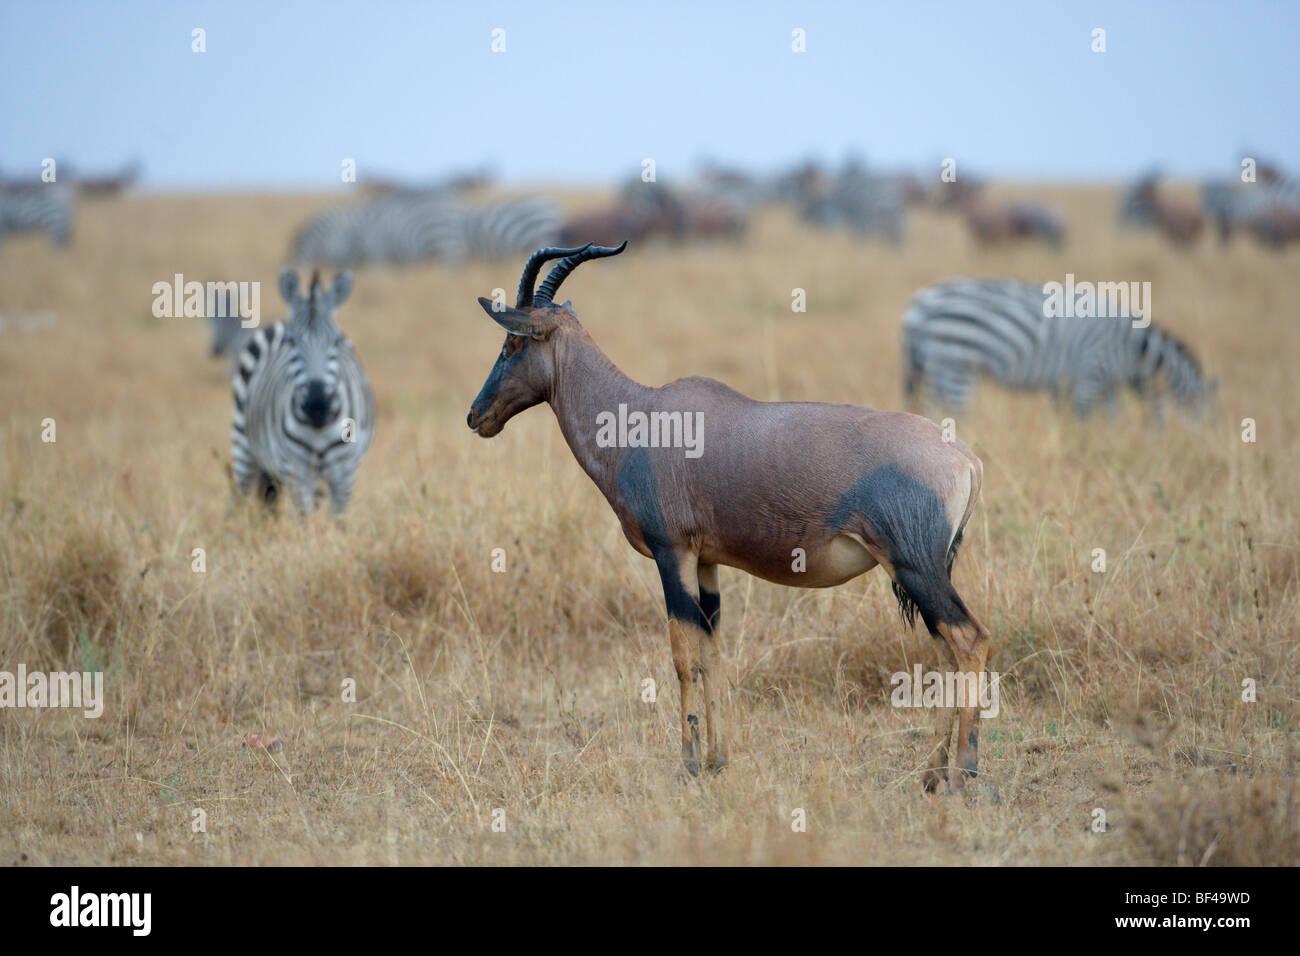 Topi, Damaliscus lunatus, looking out for preditors. Masai Mara National Reserve, Kenya. - Stock Image